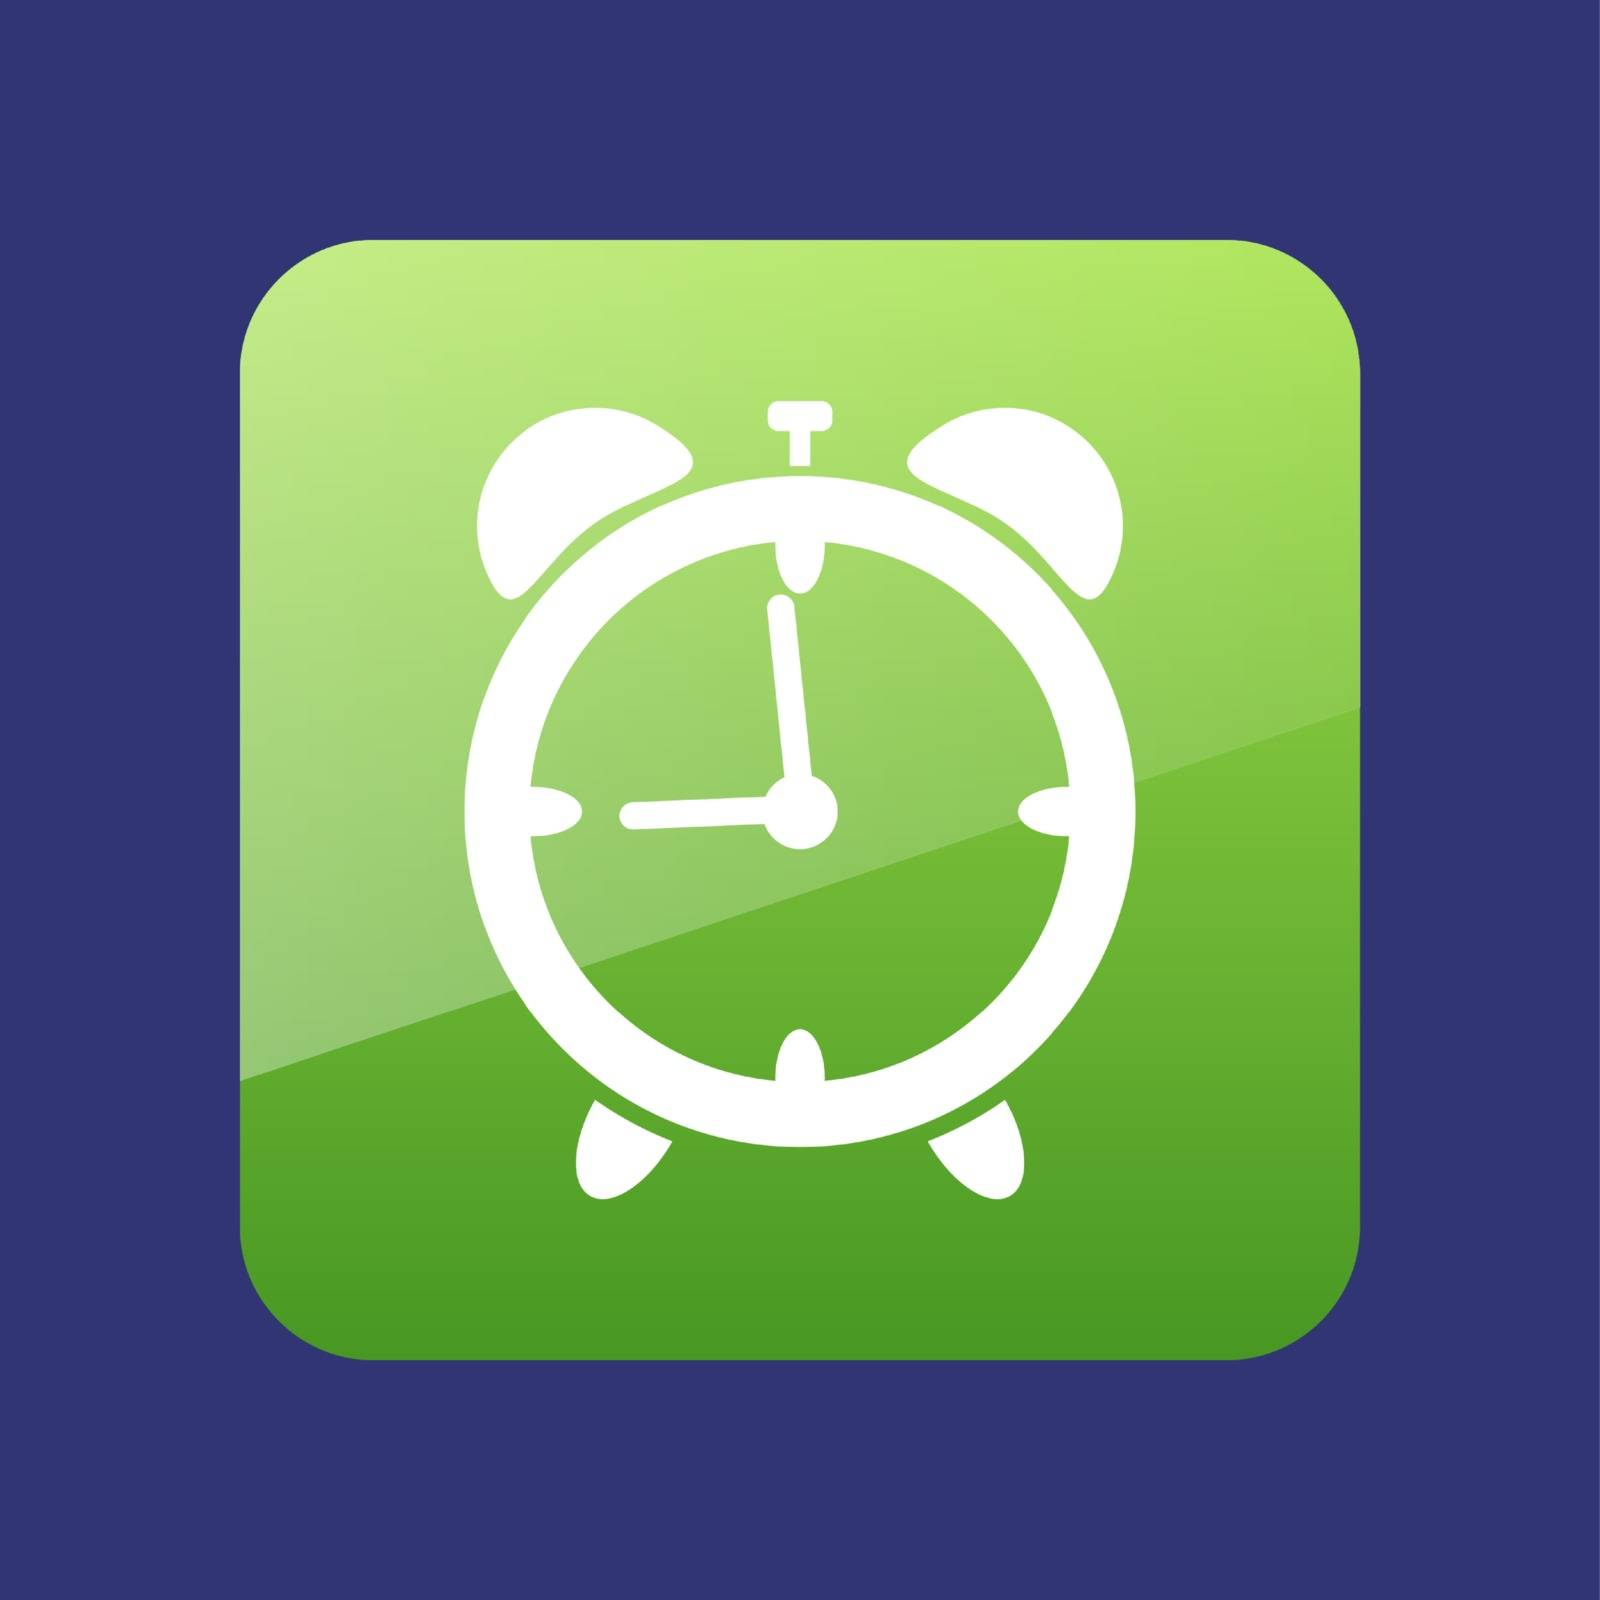 Alarm Clock vector icon, travel illustration , eps 10